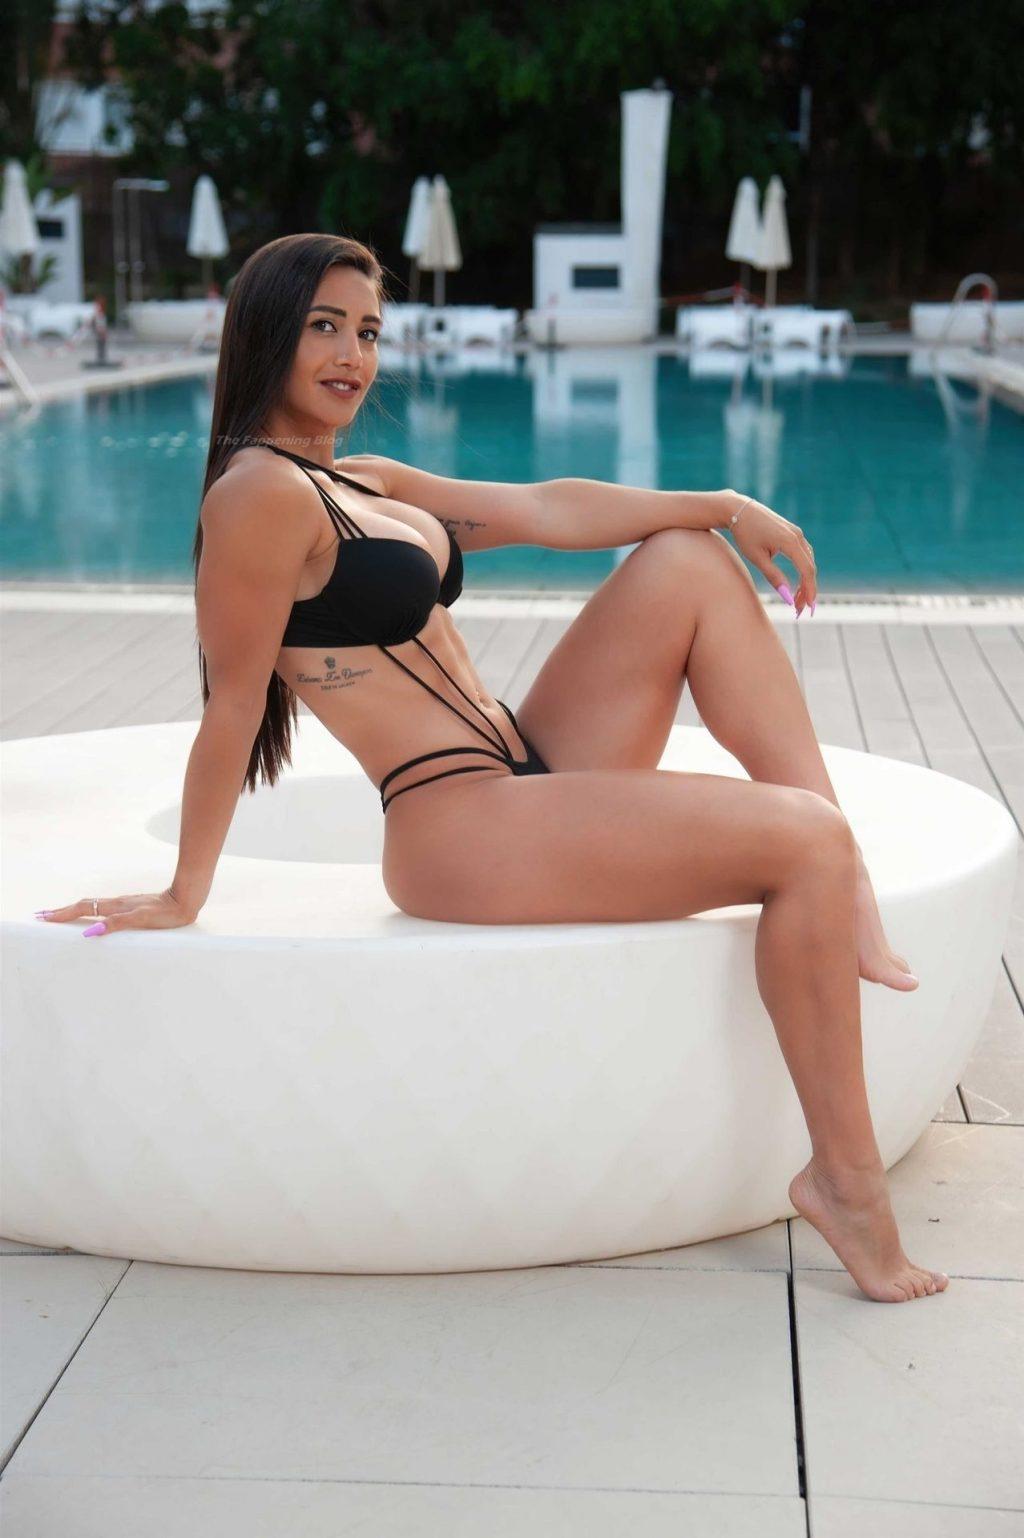 Majooh Barbeito Shows Off Her Amazing Toned Body (24 Photos)